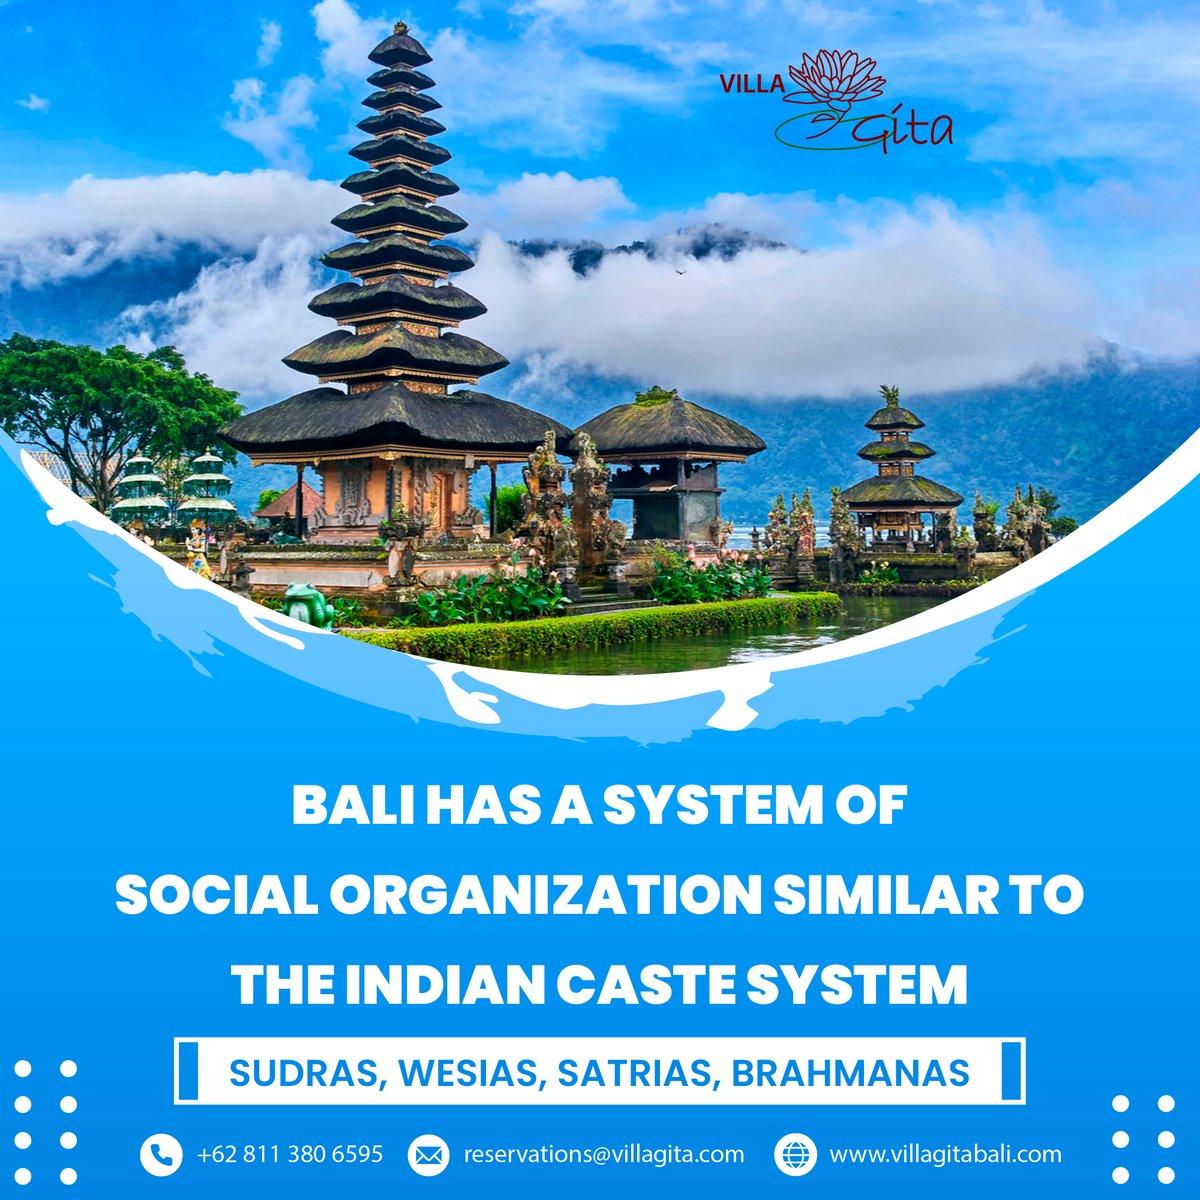 Bali has a system of social organization similar to the Indian caste system- Sudras, Wesias, Satrias, Brahmanas.   +62 811 380 6595 #balineseculture #socialorganization #kuningan #music #events #happy #happiness #art  #familytime #balinese  #celebration